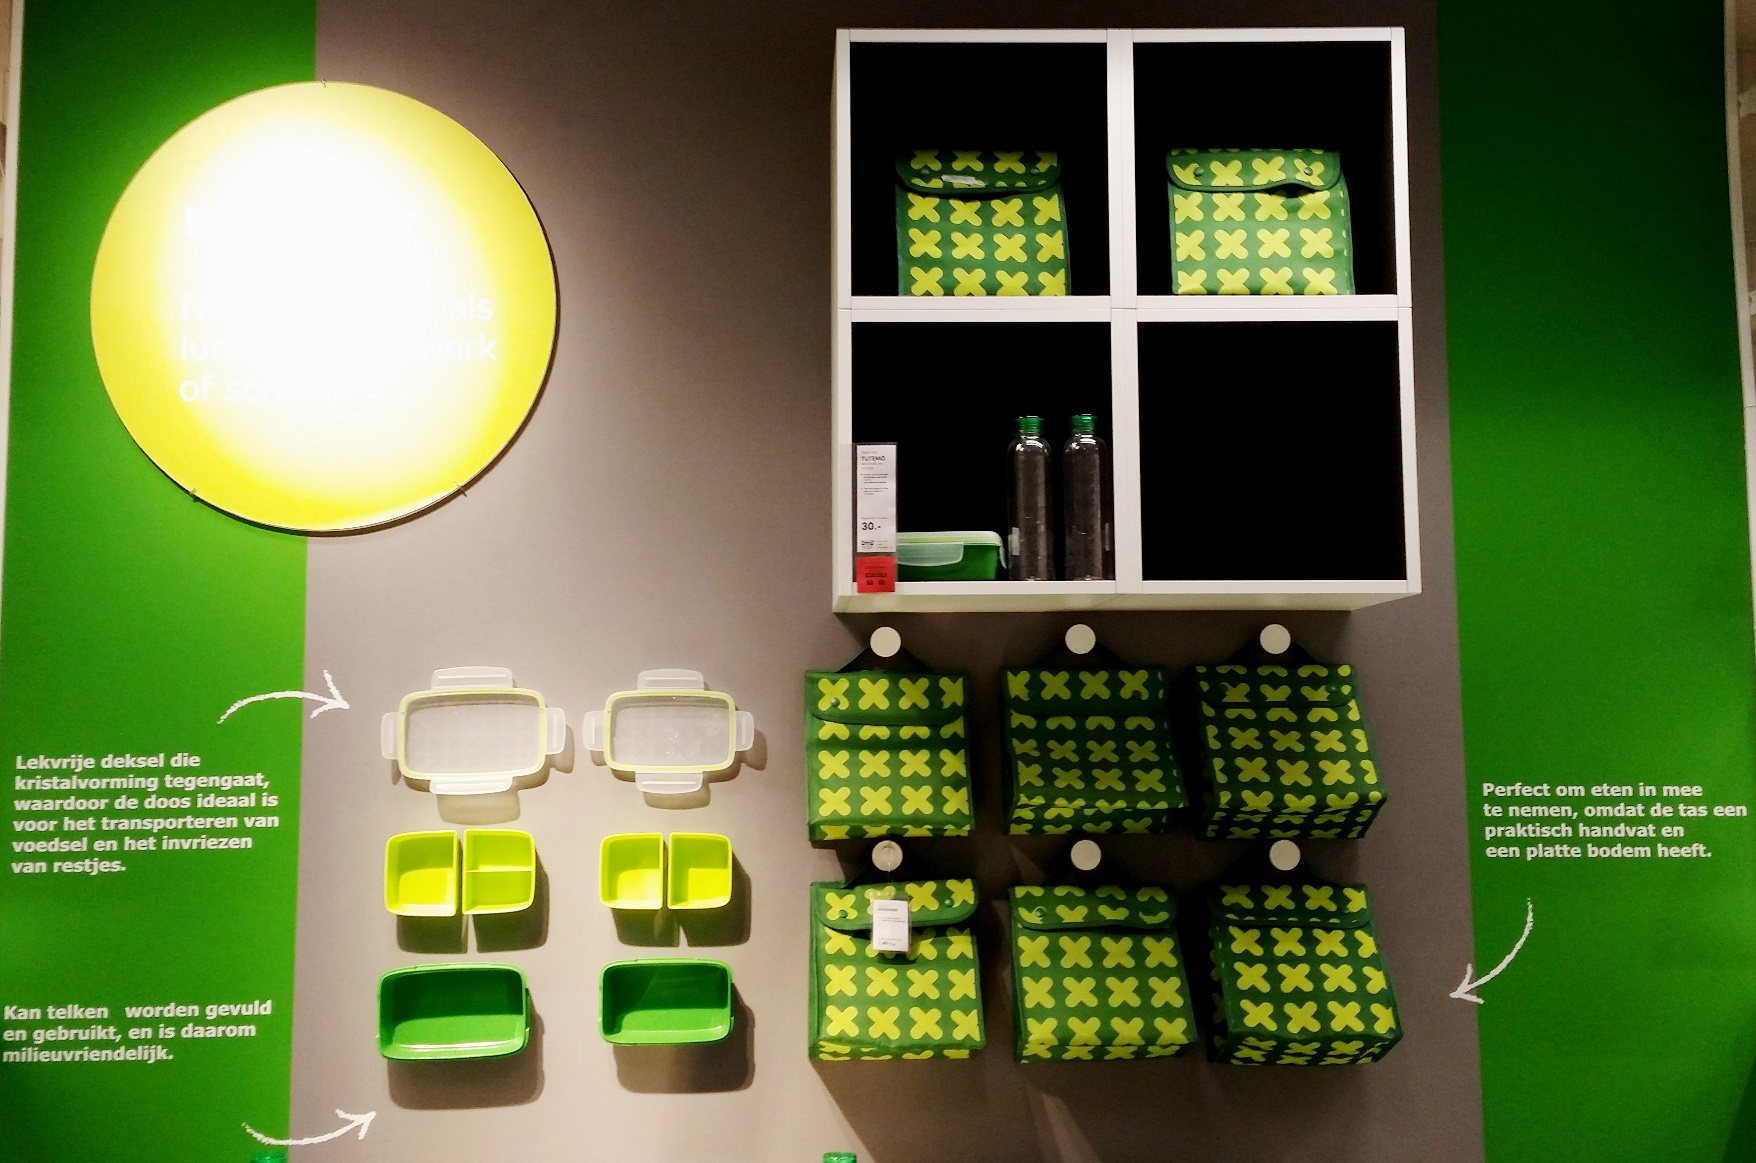 duurzaam IKEA